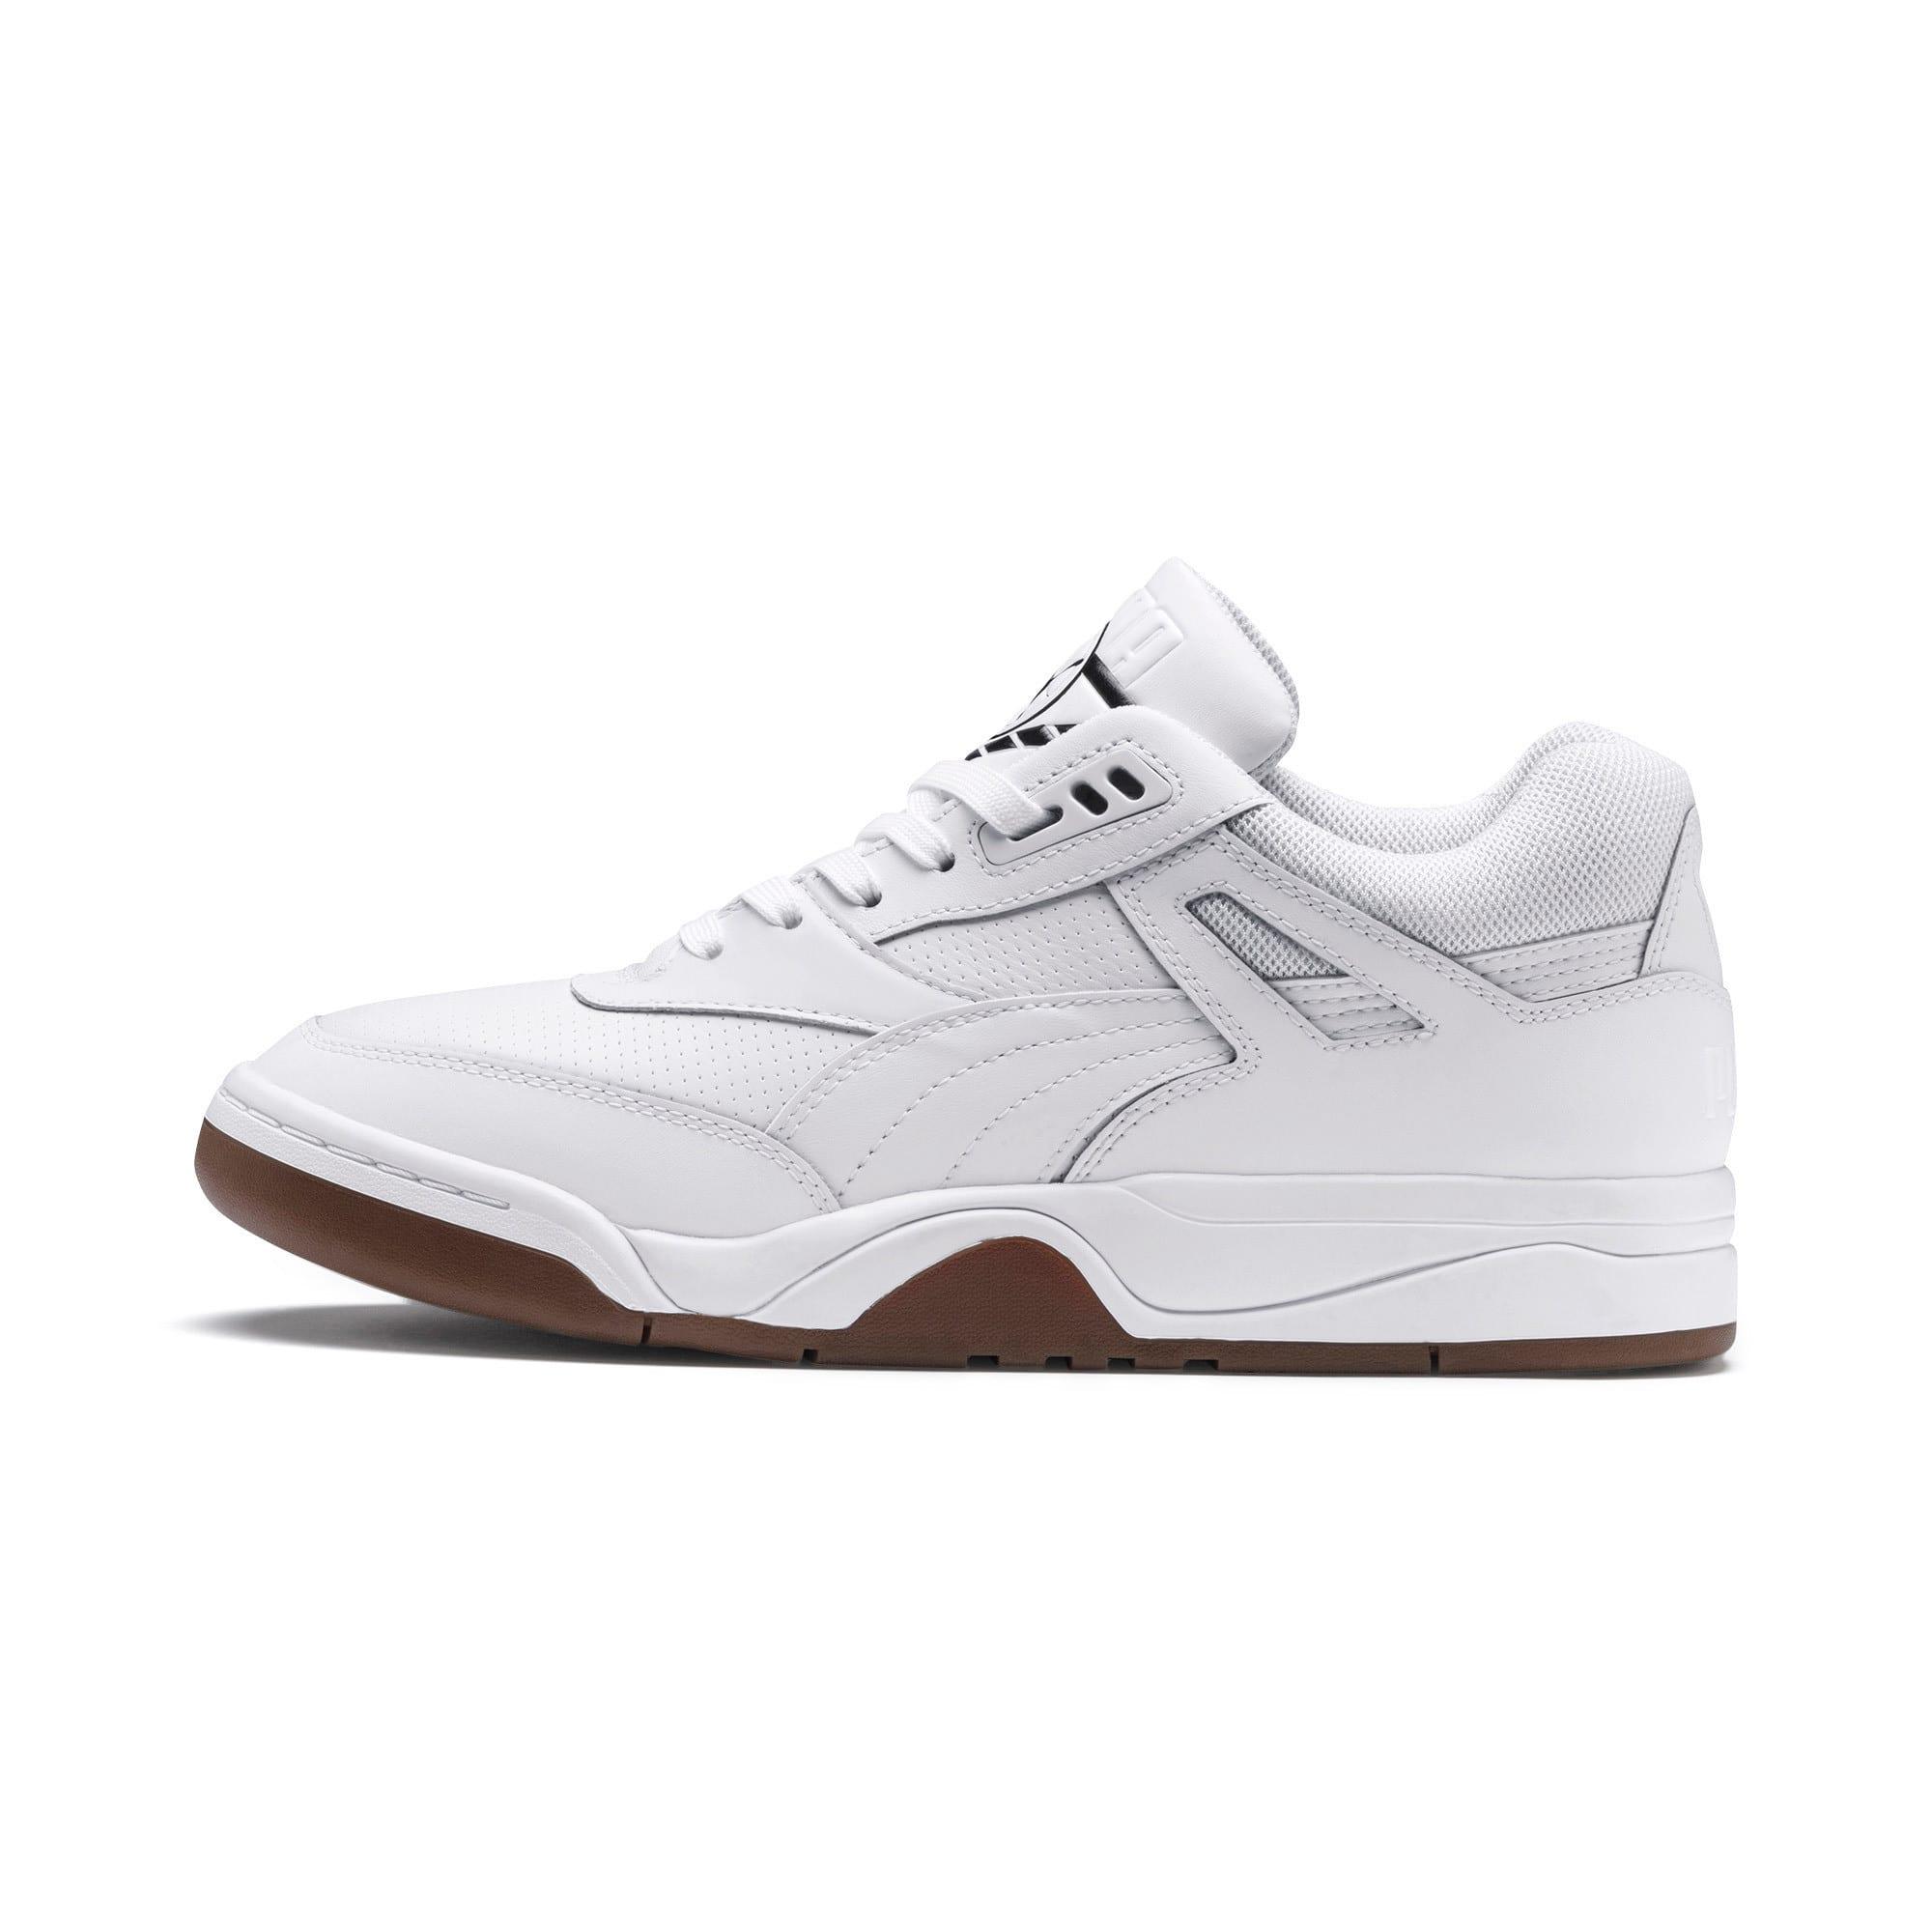 Thumbnail 1 of Palace Guard Sneakers, Puma White-Puma White-Gum, medium